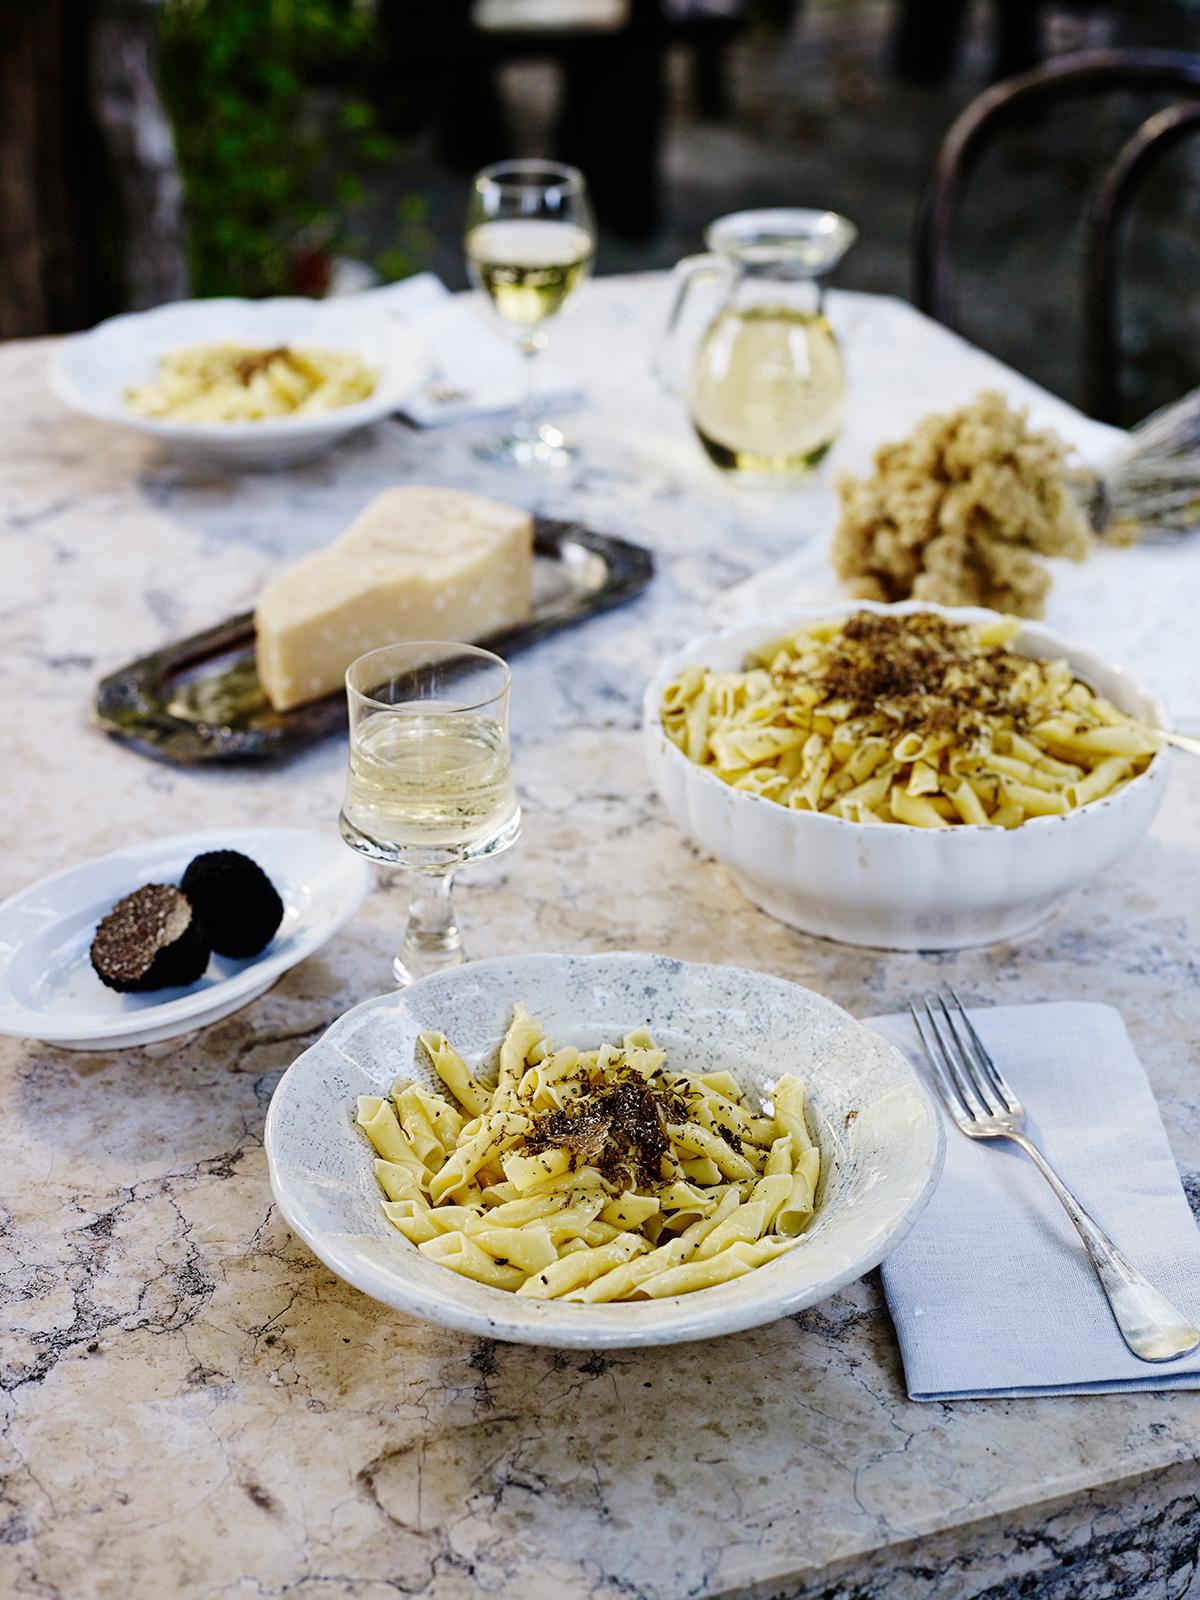 istrska_kulinarika_istrian_cuisine_photo_matevz_kostanjsek_in_grusa_zorn_orig_jpg-photo-l-2